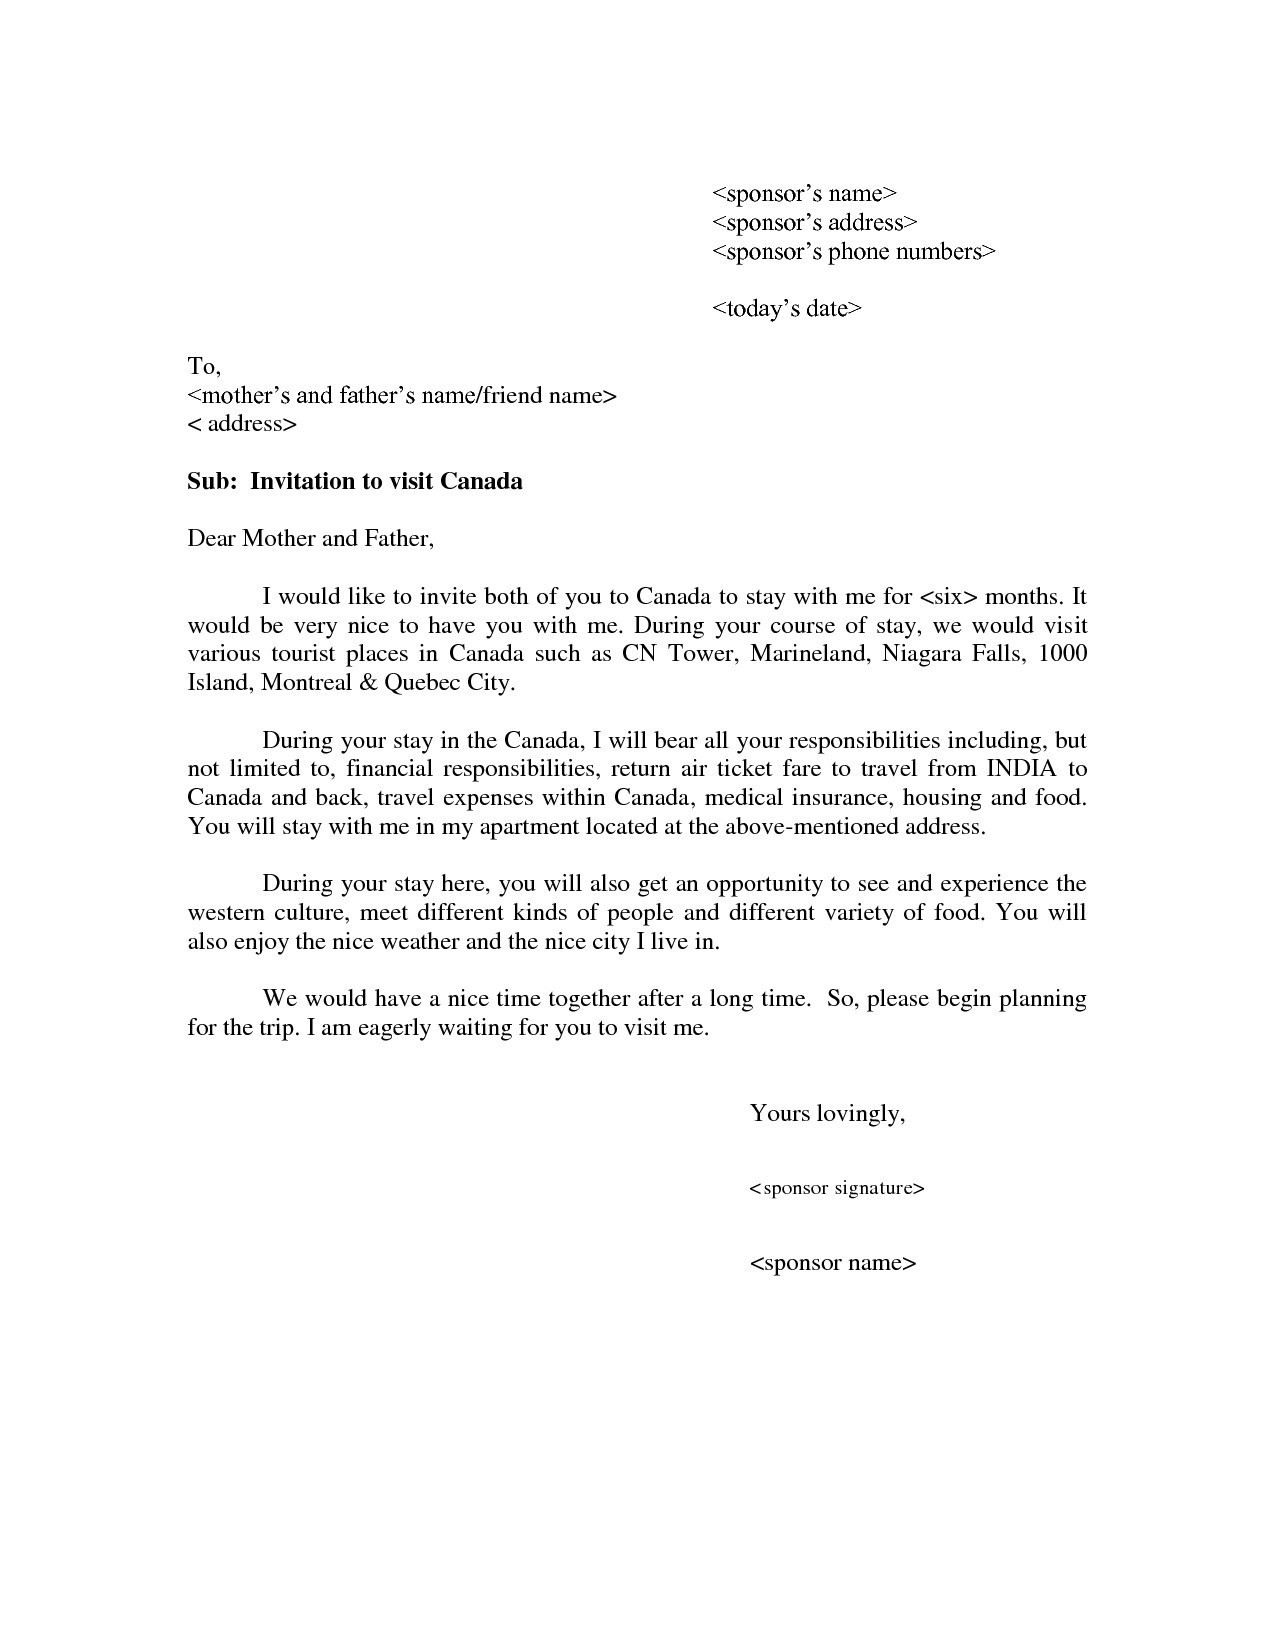 Cover Letter Template For Tourist Visa Letter templates